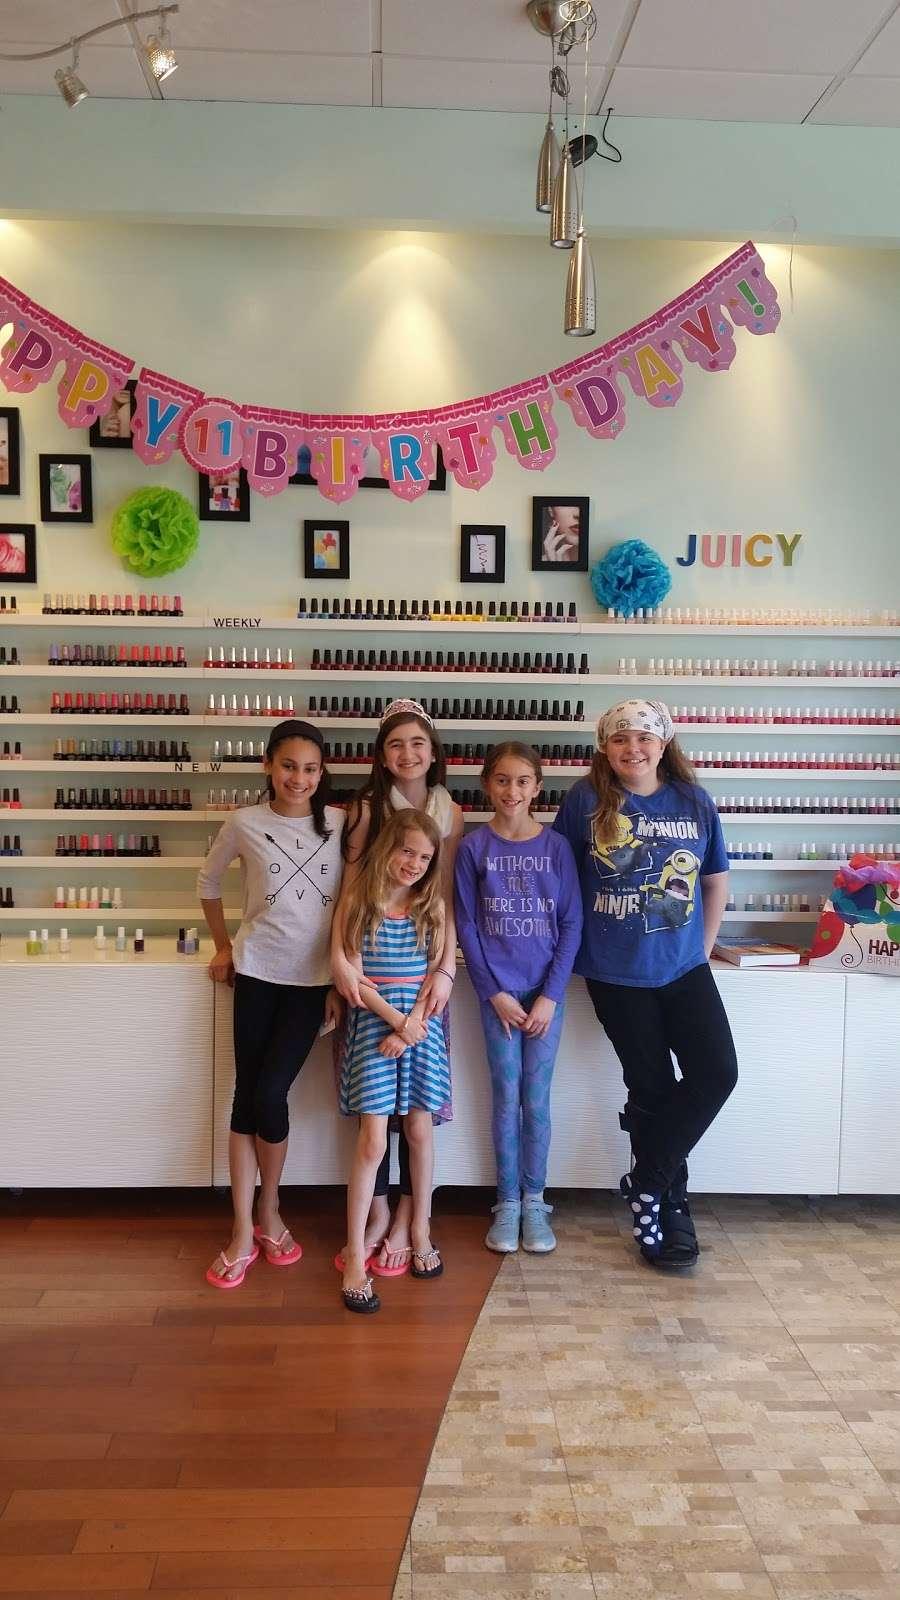 Juicy Nails & Spa - hair care    Photo 6 of 10   Address: 525 Main St #6, Monroe, CT 06468, USA   Phone: (203) 459-9494